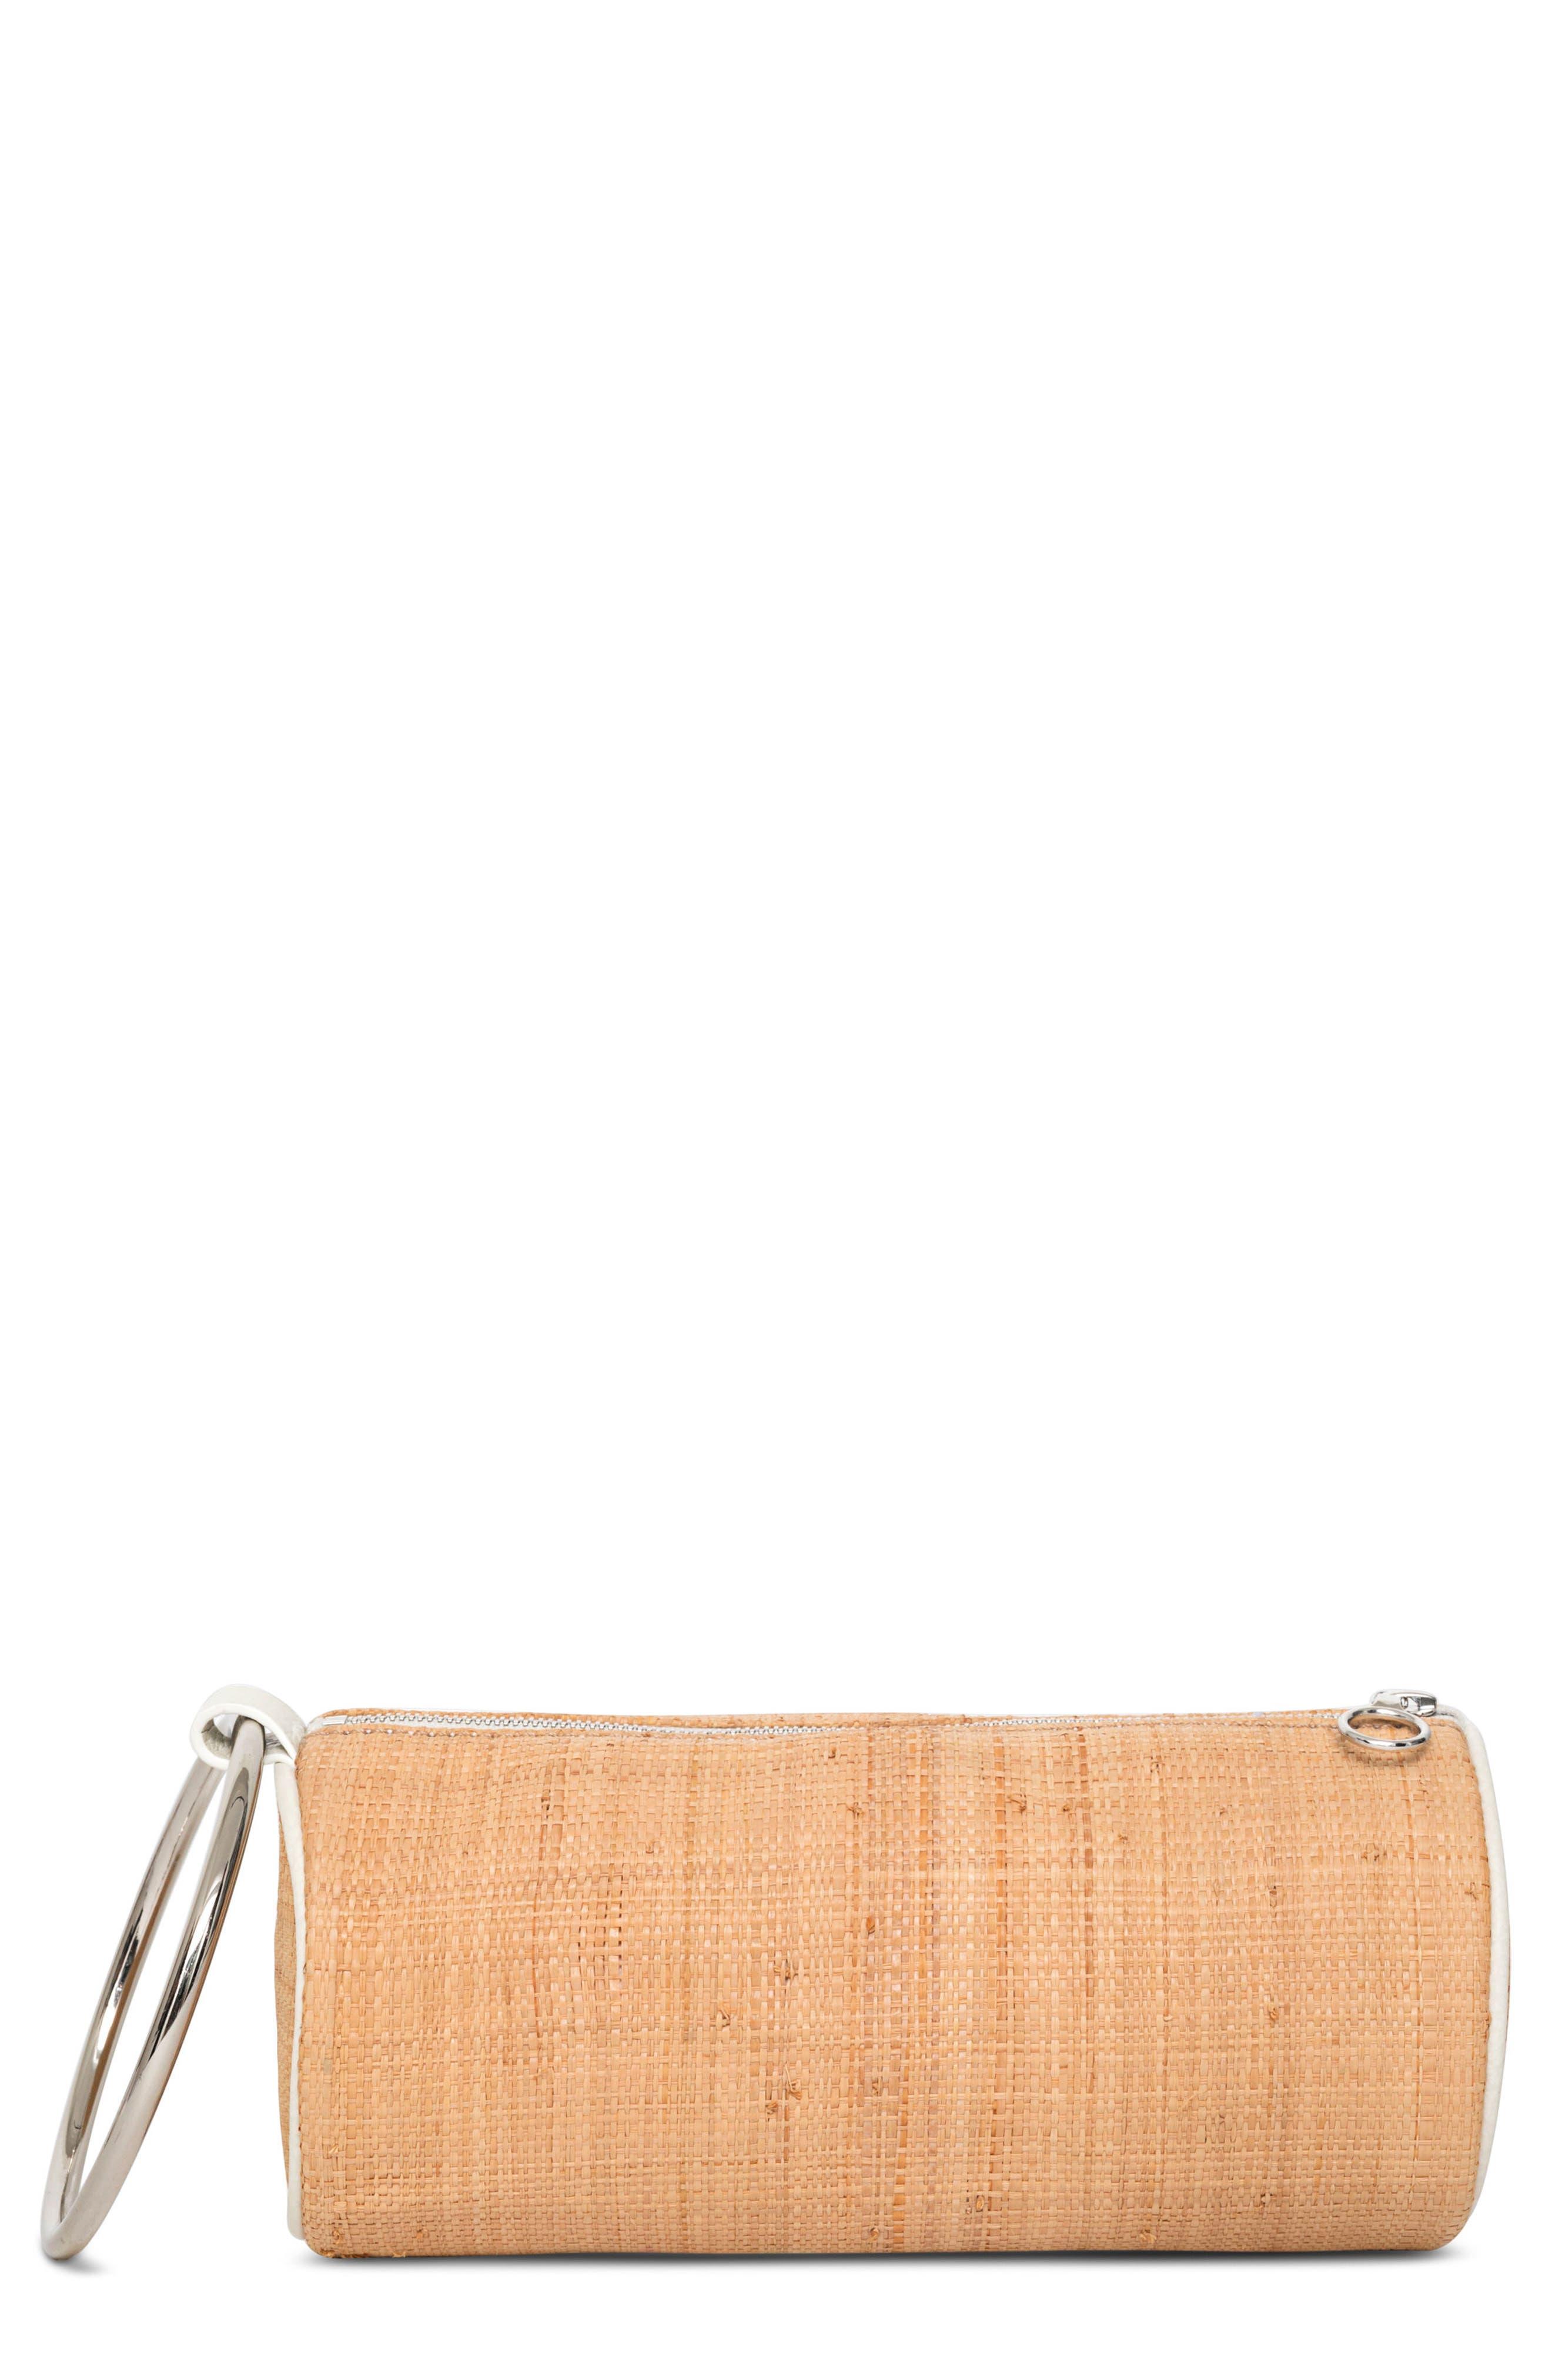 Straw Duffel Wristlet Clutch,                         Main,                         color, Natural